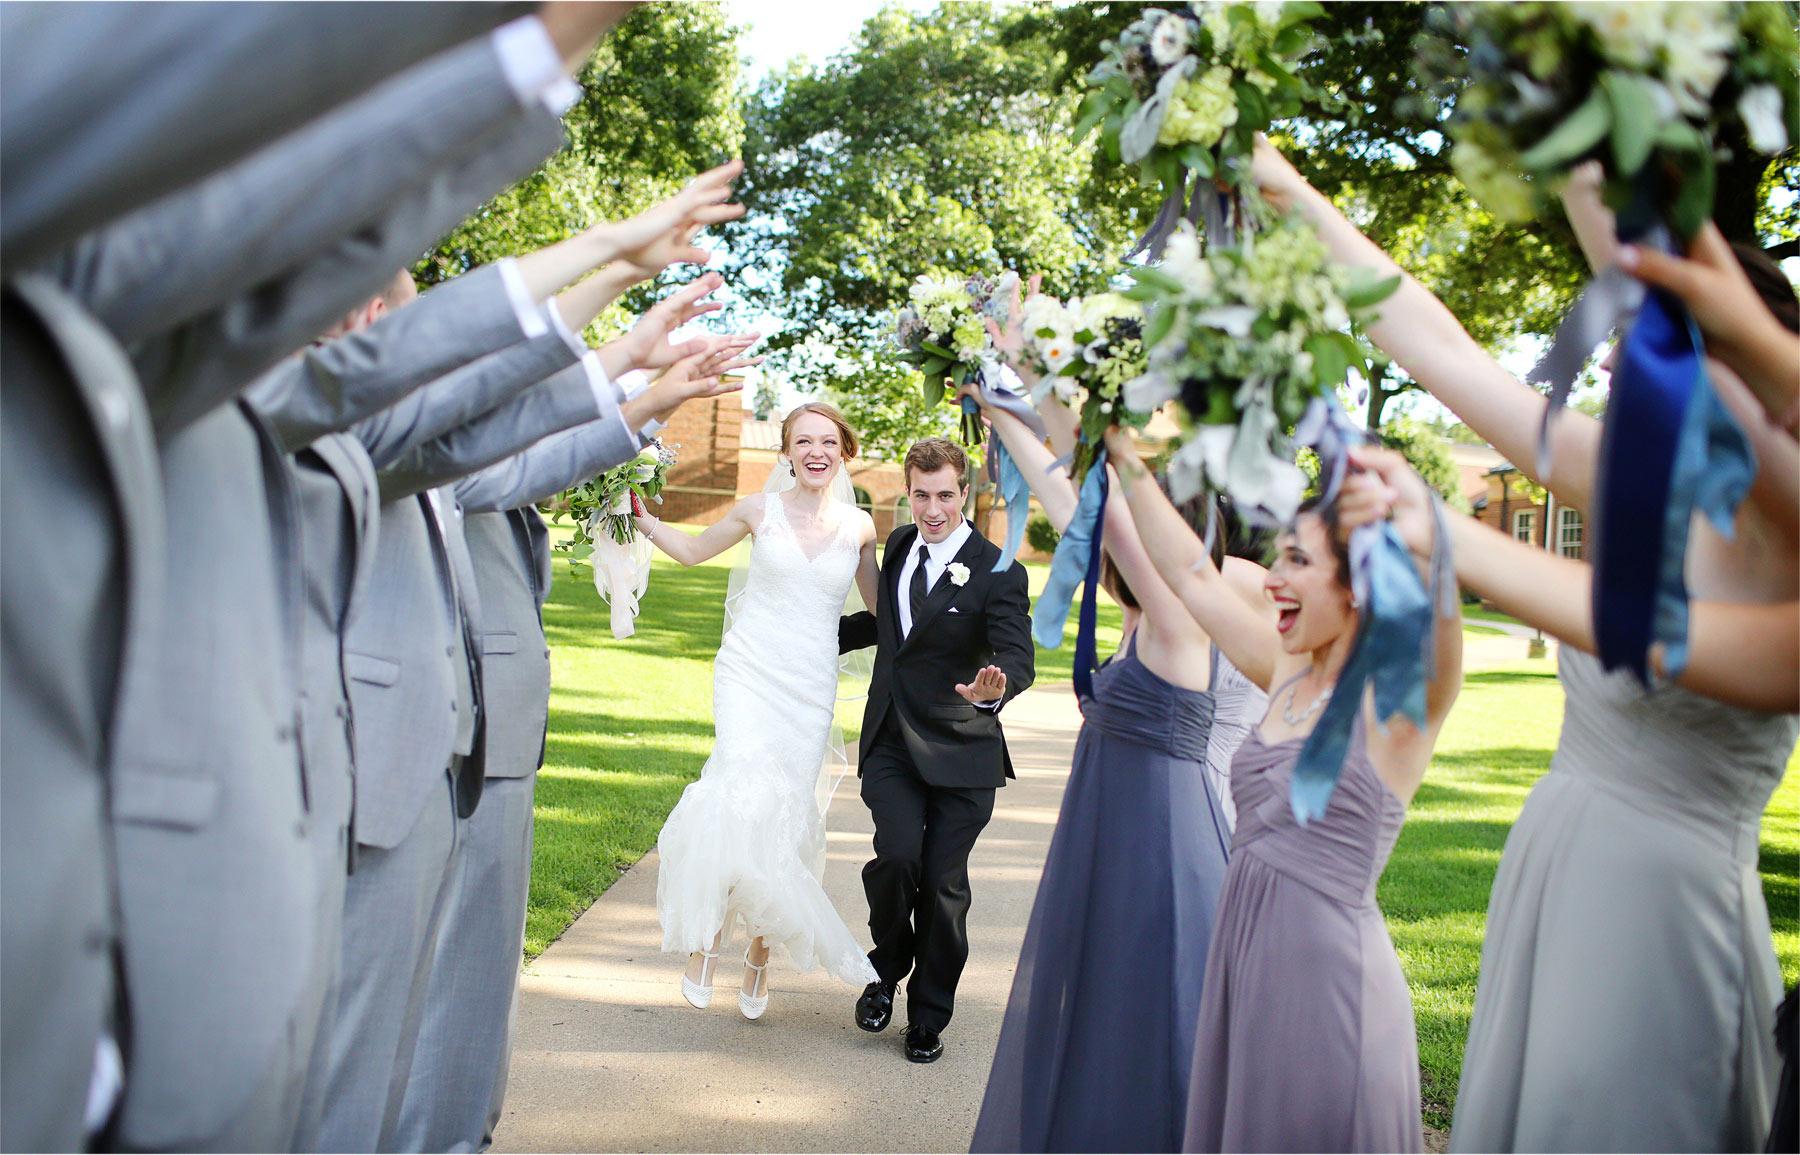 18-Edina-Minnesota-Wedding-Photographer-by-Andrew-Vick-Photography-Summer-Our-Lady-of-Grace-Catholic-Parish-Church-Bride-Groom-Bridal-Party-Bridesmaids-Groomsmen-Excitement-Betsy-and-Jon.jpg